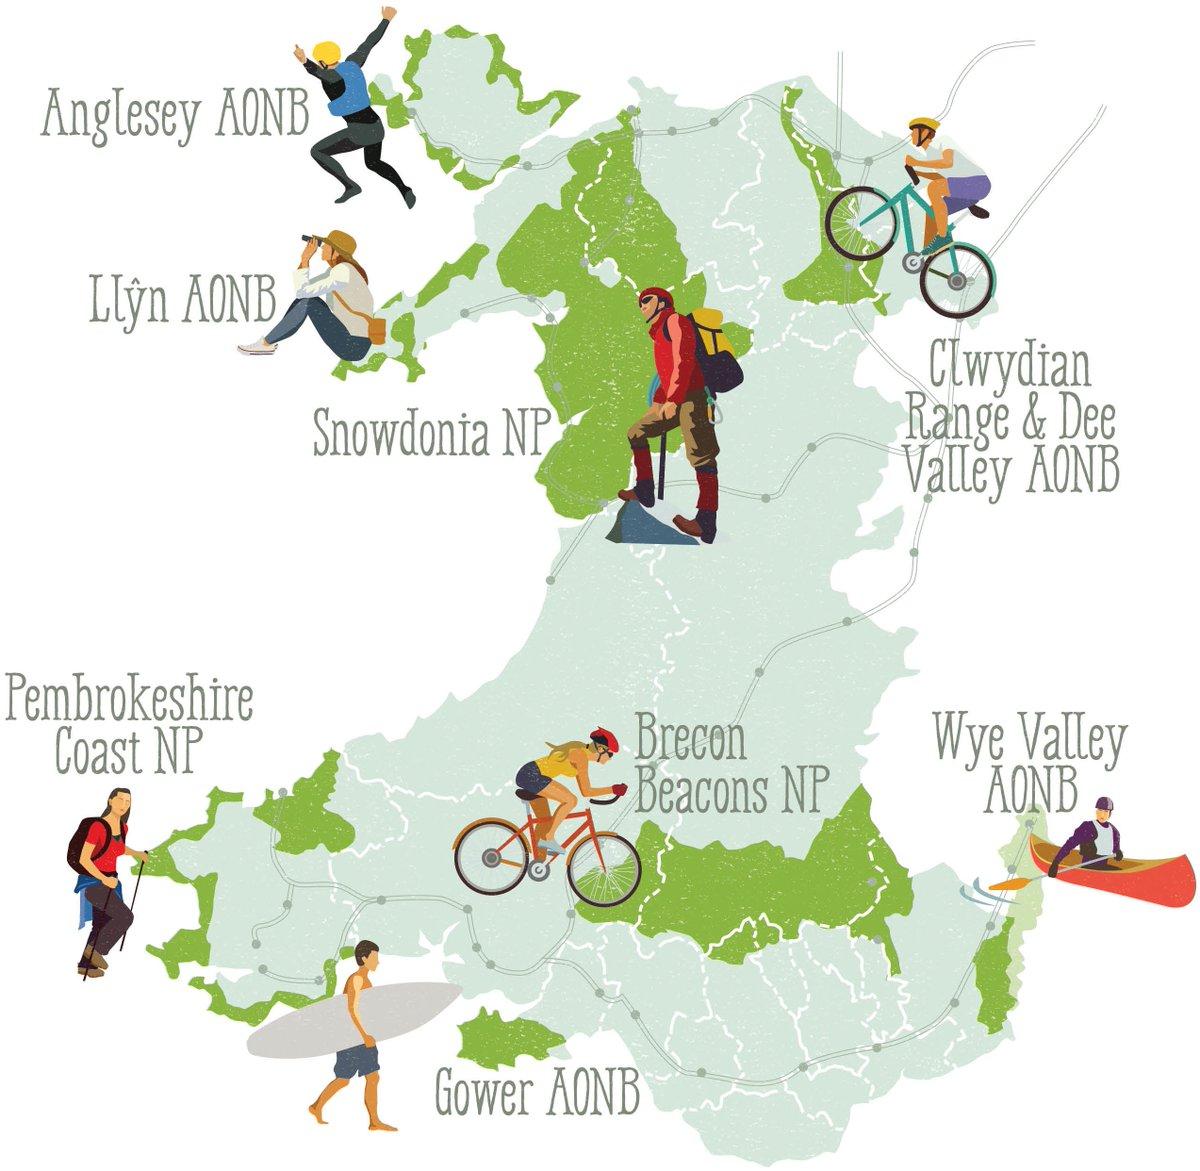 Looking forward to the next few days Weekend of Adventure across #Wales #FindYourEpic: https://t.co/tiFl1PDIrE https://t.co/7fwY8Pj65y